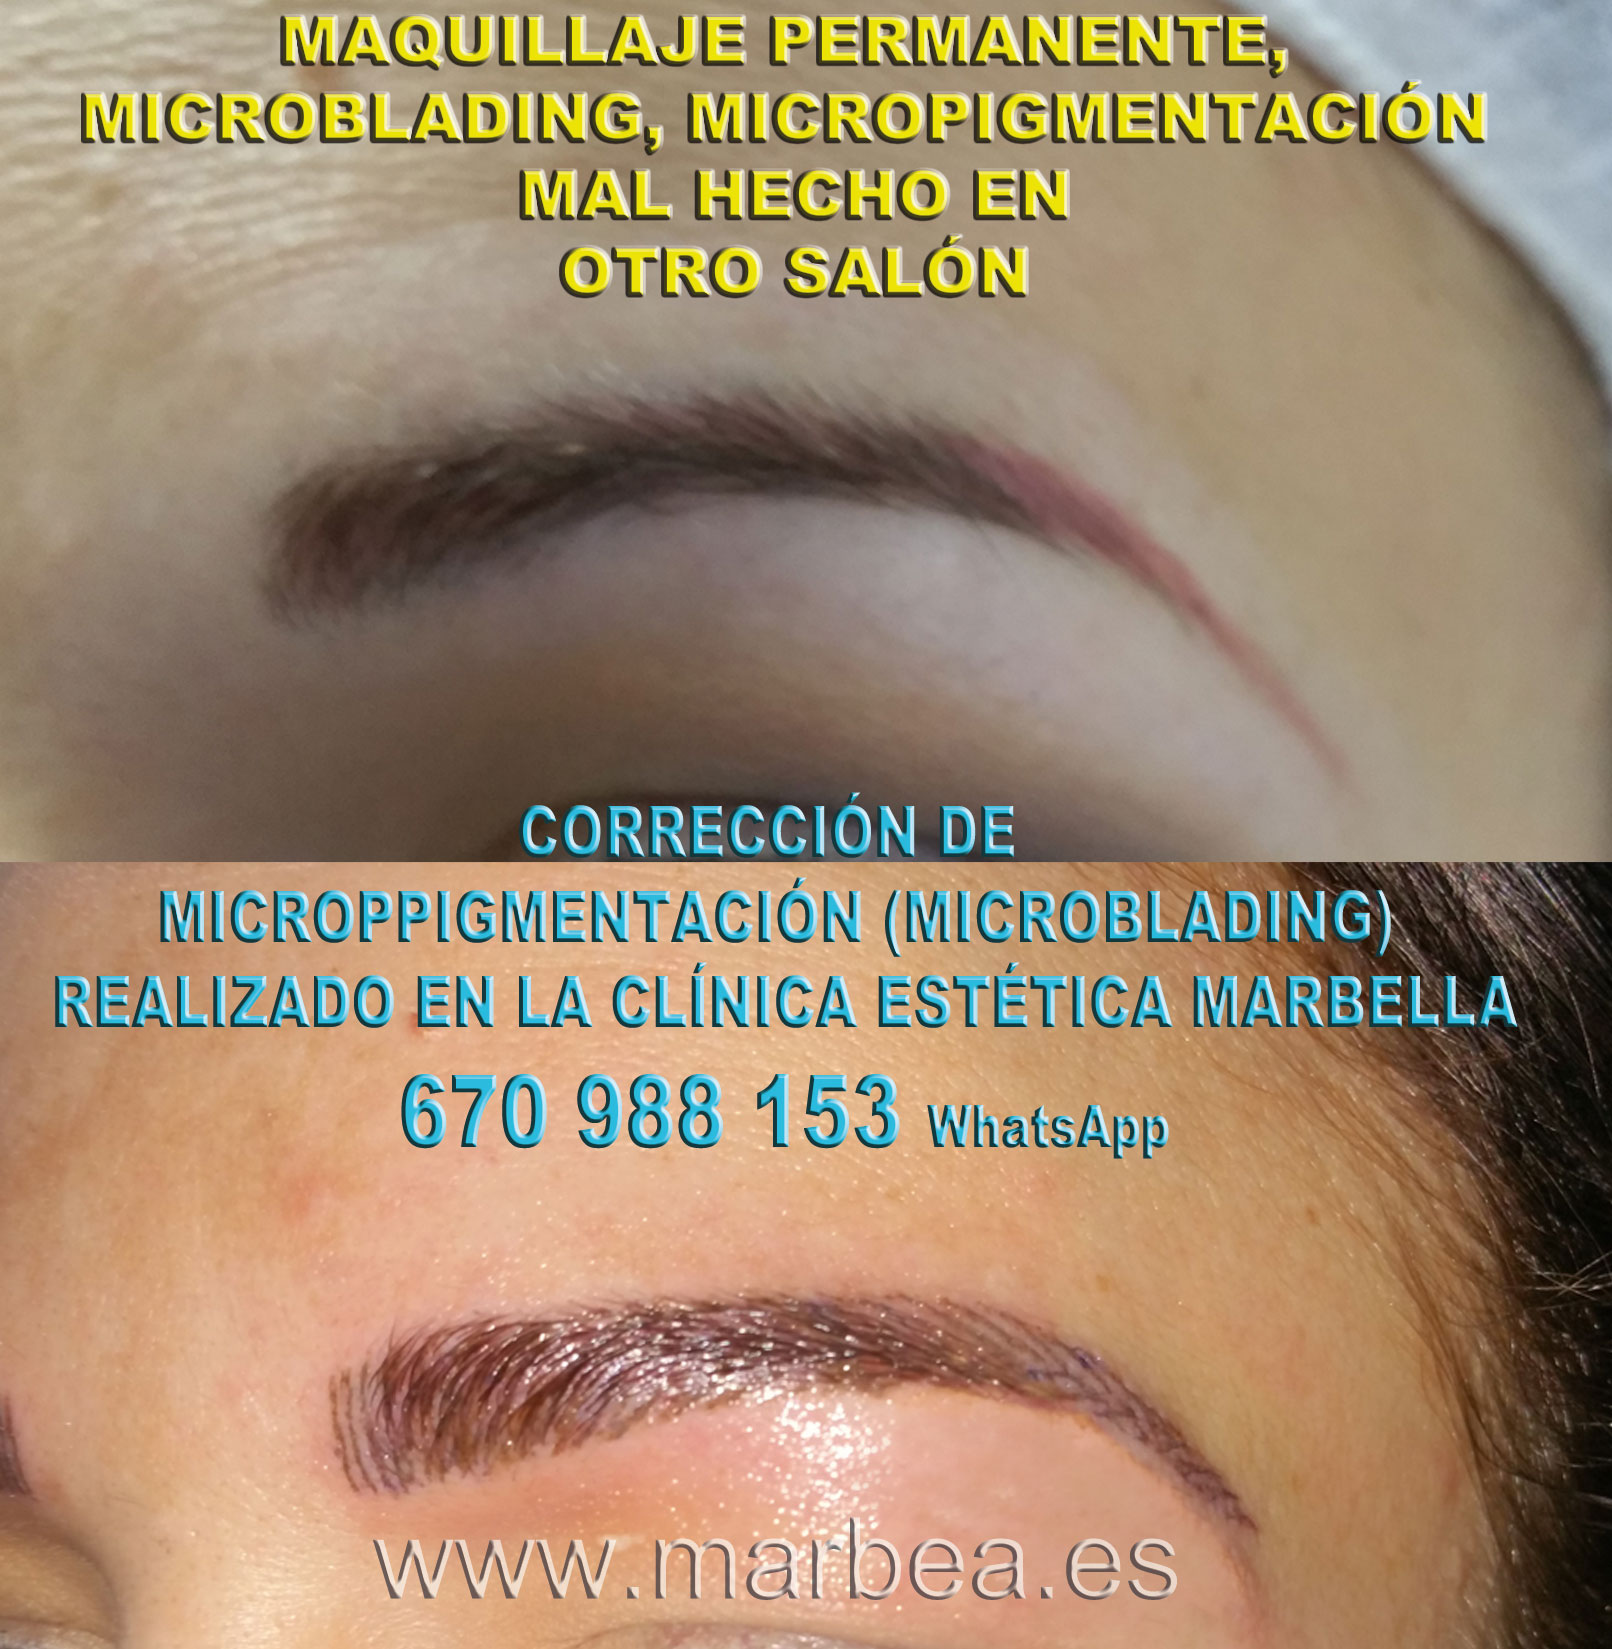 ELIMINAR TATUAJE CEJAS clínica estética micropigmentación propone micropigmentacion correctiva de cejas,micropigmentación correctiva cejas mal hecha